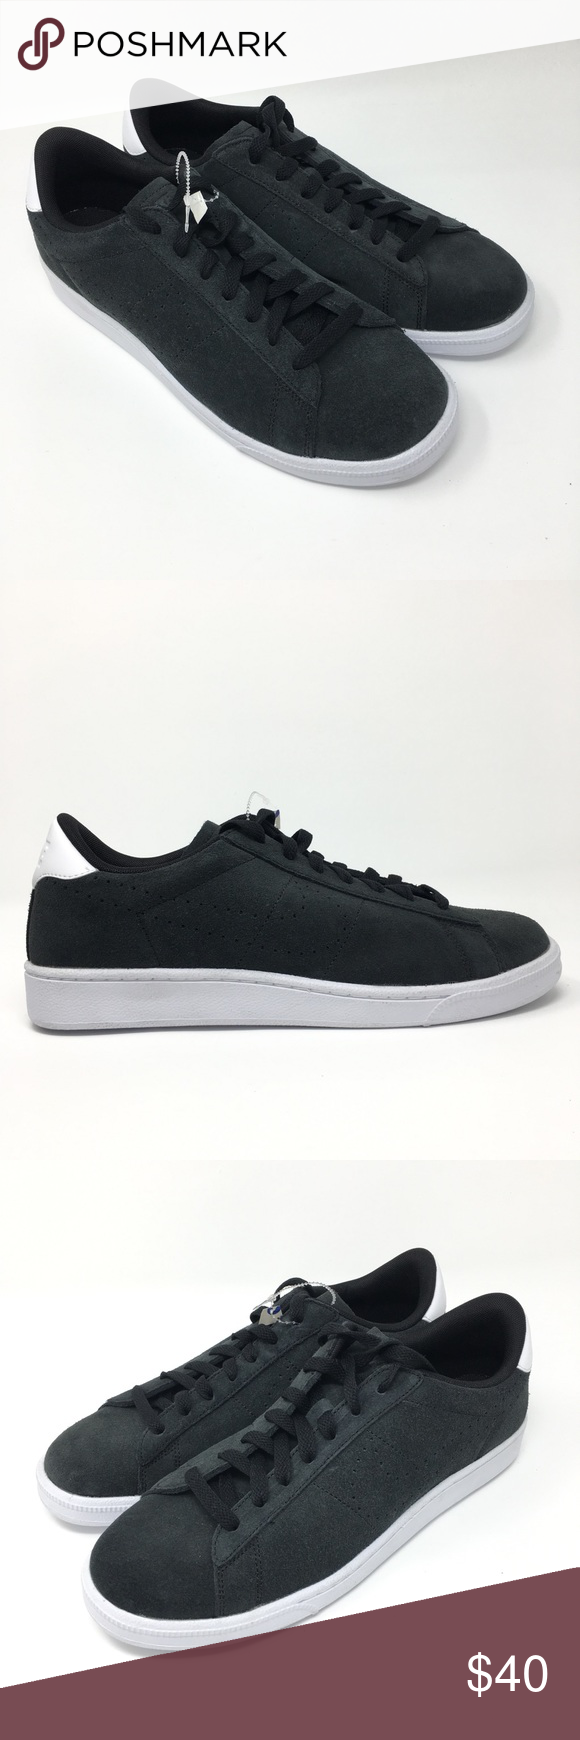 buy popular 16151 f51ab Nike Tennis Classic CS Suede sneaker 9.5 Nike Tennis Classic CS Suede  829351-002 Black